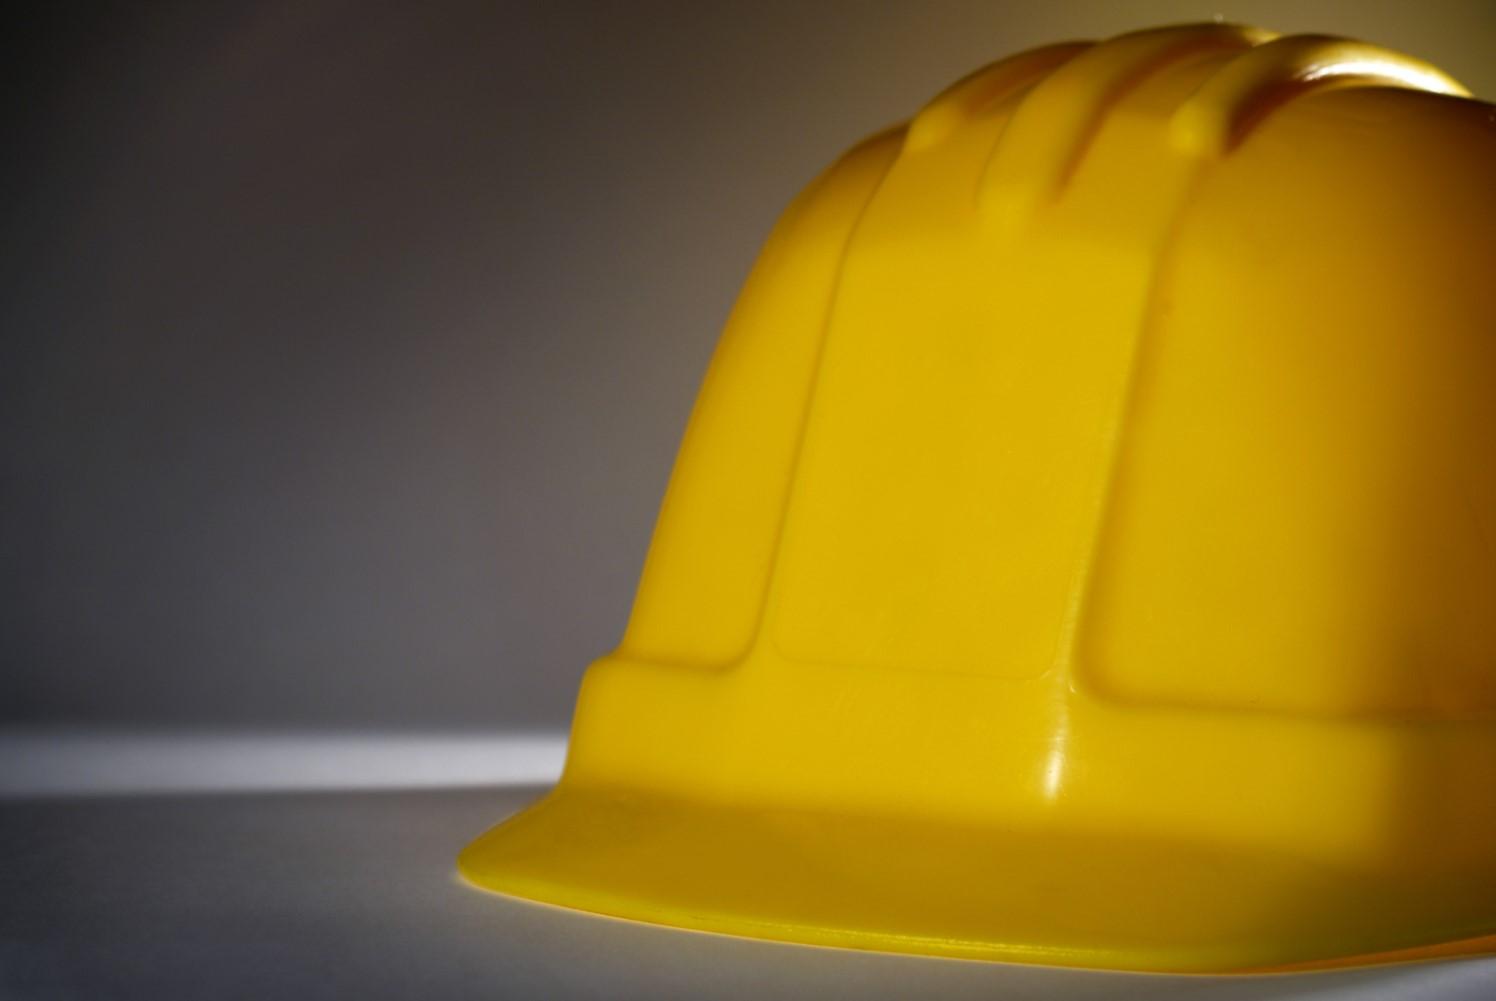 Head injuries warning for construction hard hats